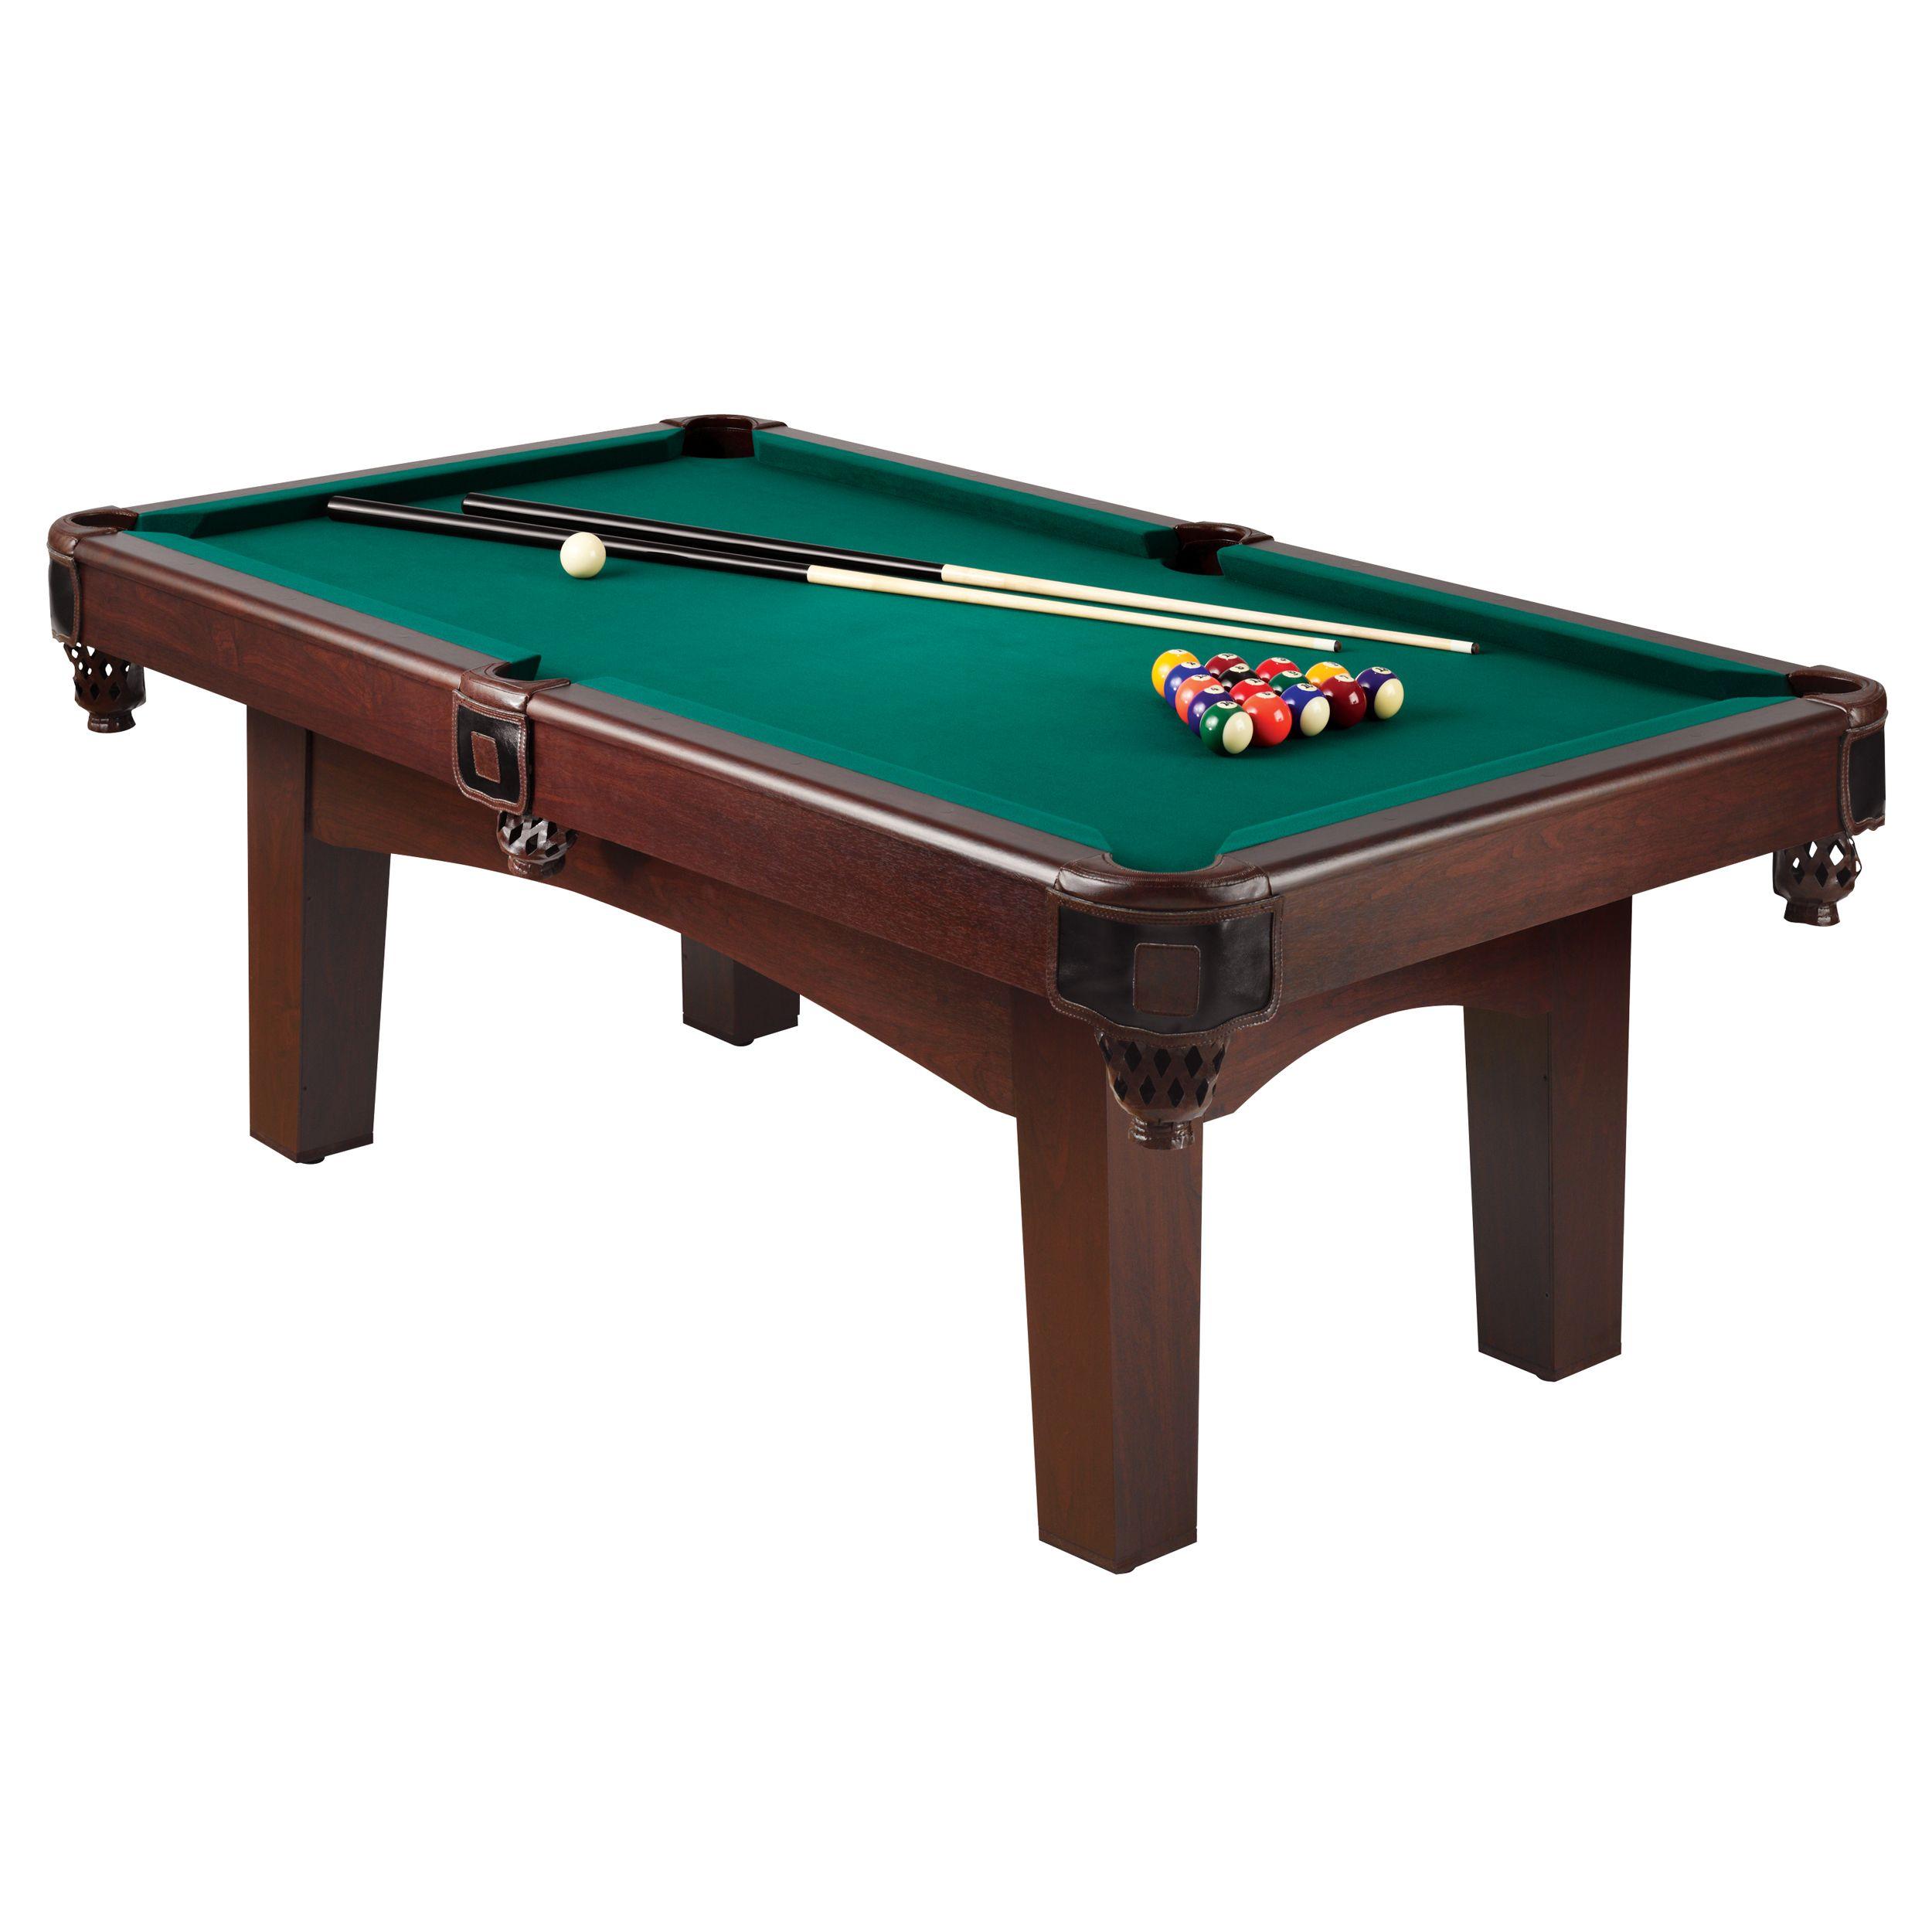 7 FT Sportcraft Pool Table